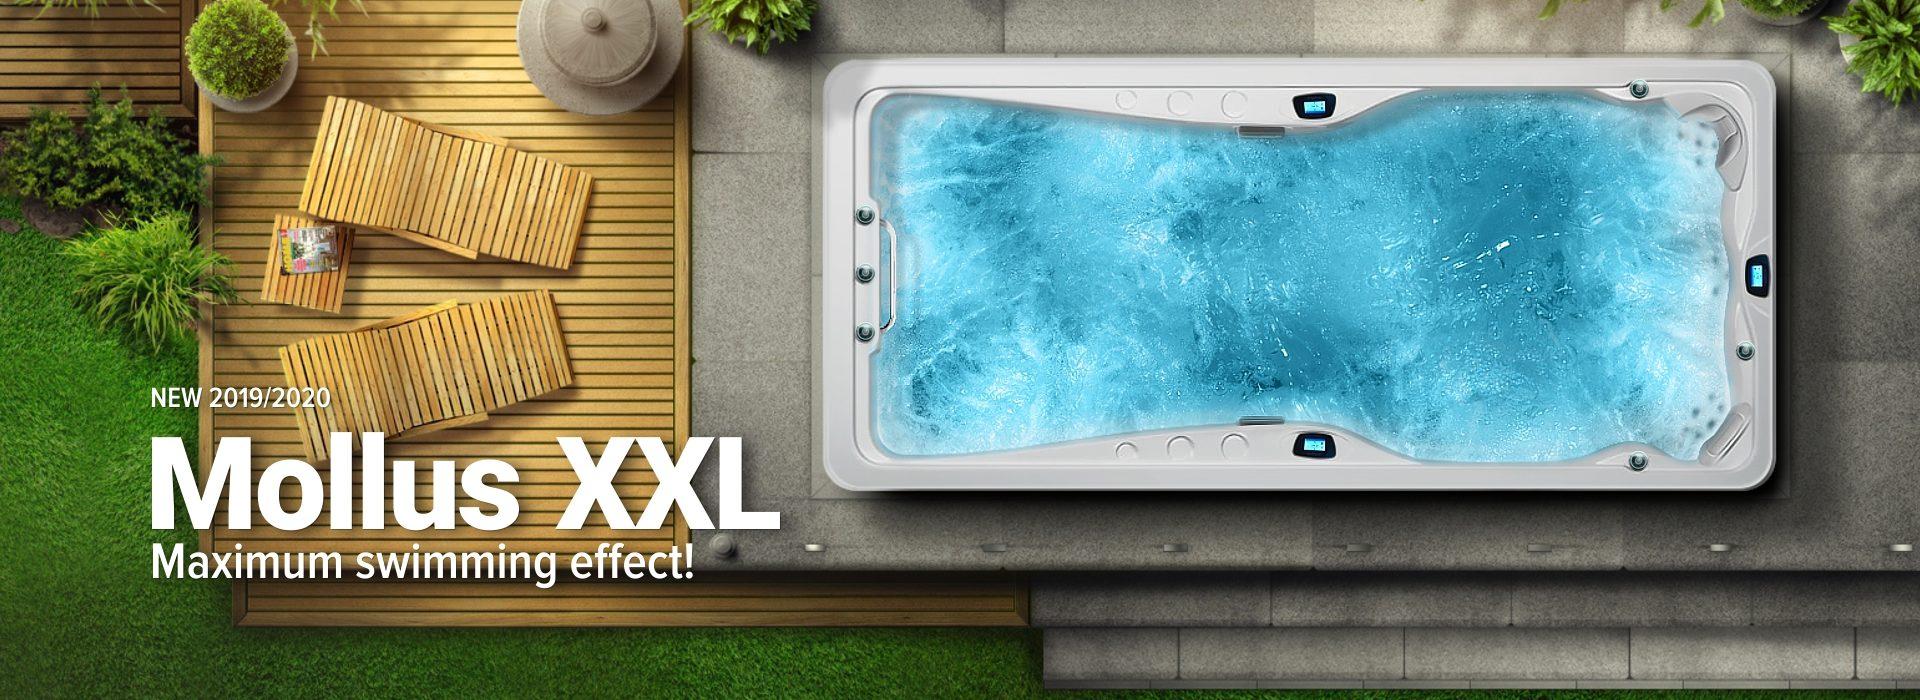 Whirlpool hot tubs Spa Studio - New swim spa 2019/2020: Mollus XXL